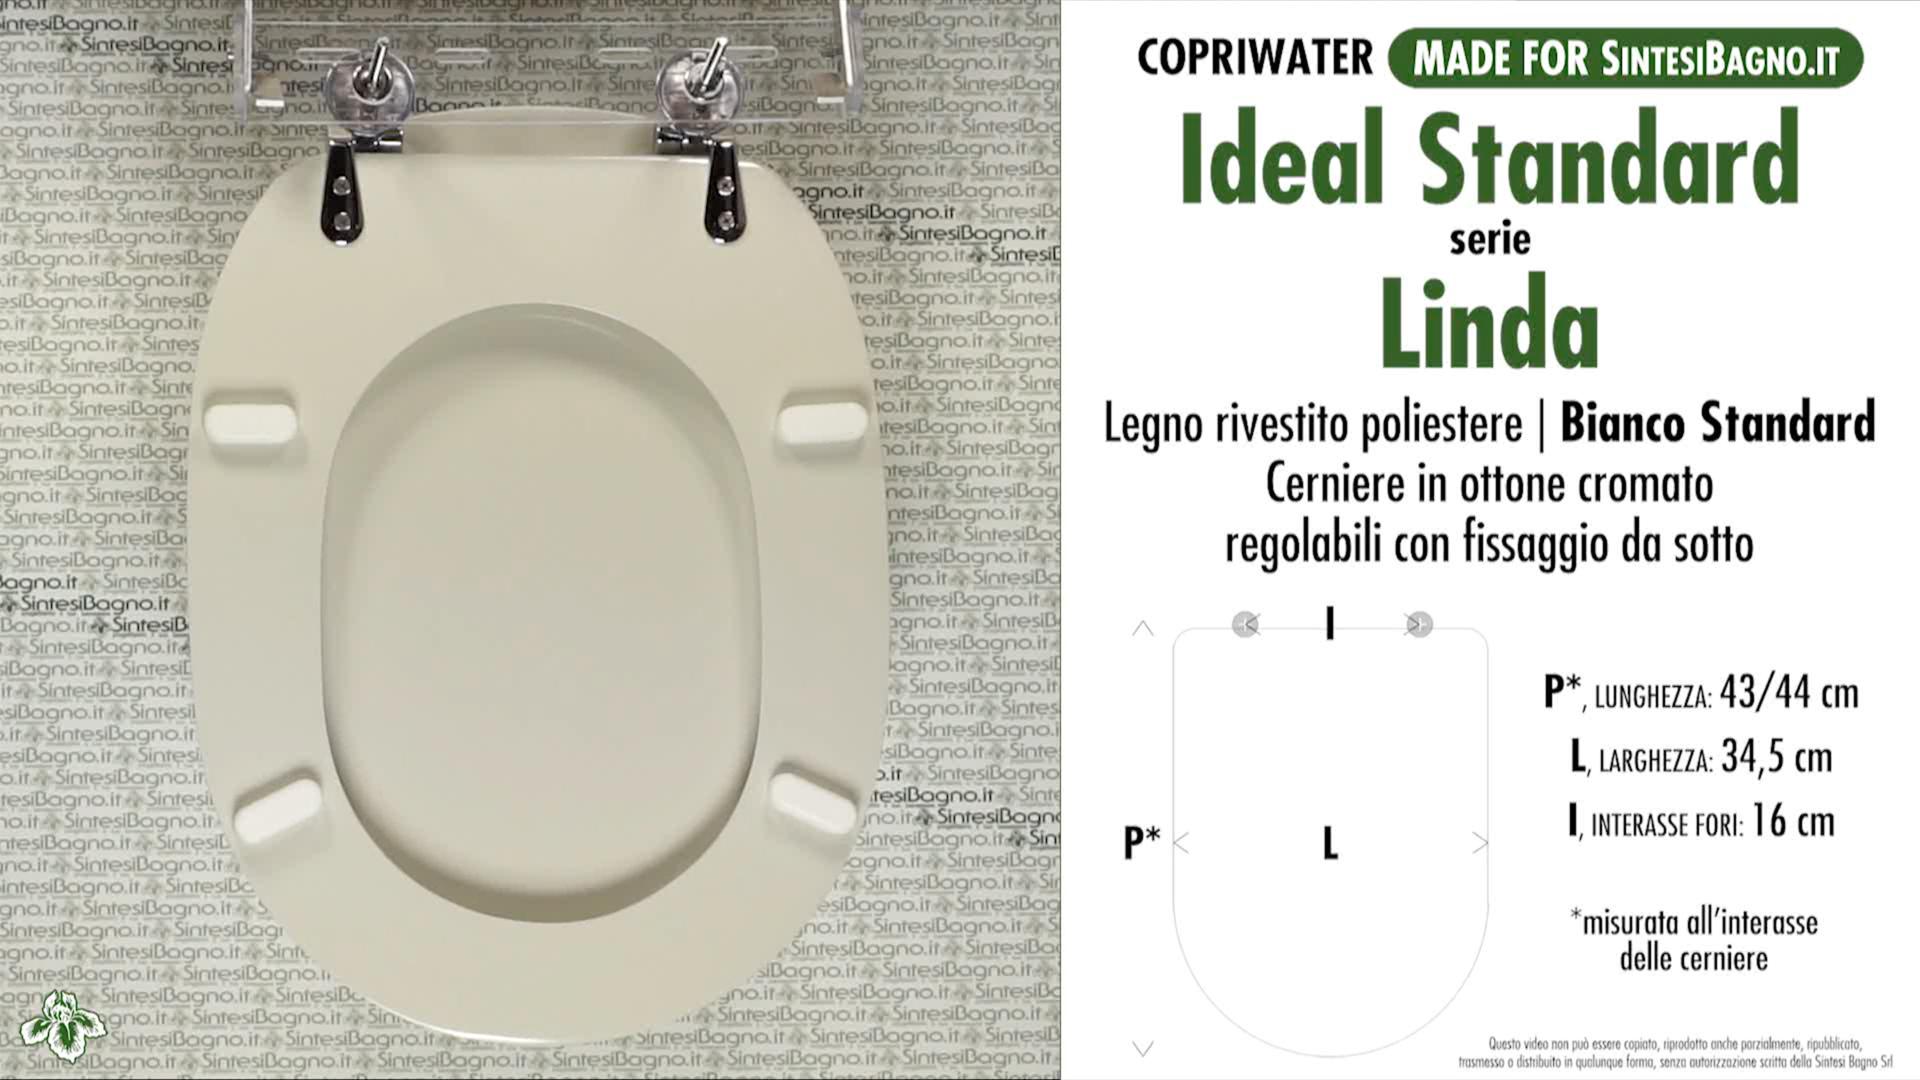 SCHEDA TECNICA MISURE copriwater IDEAL STANDARD LINDA